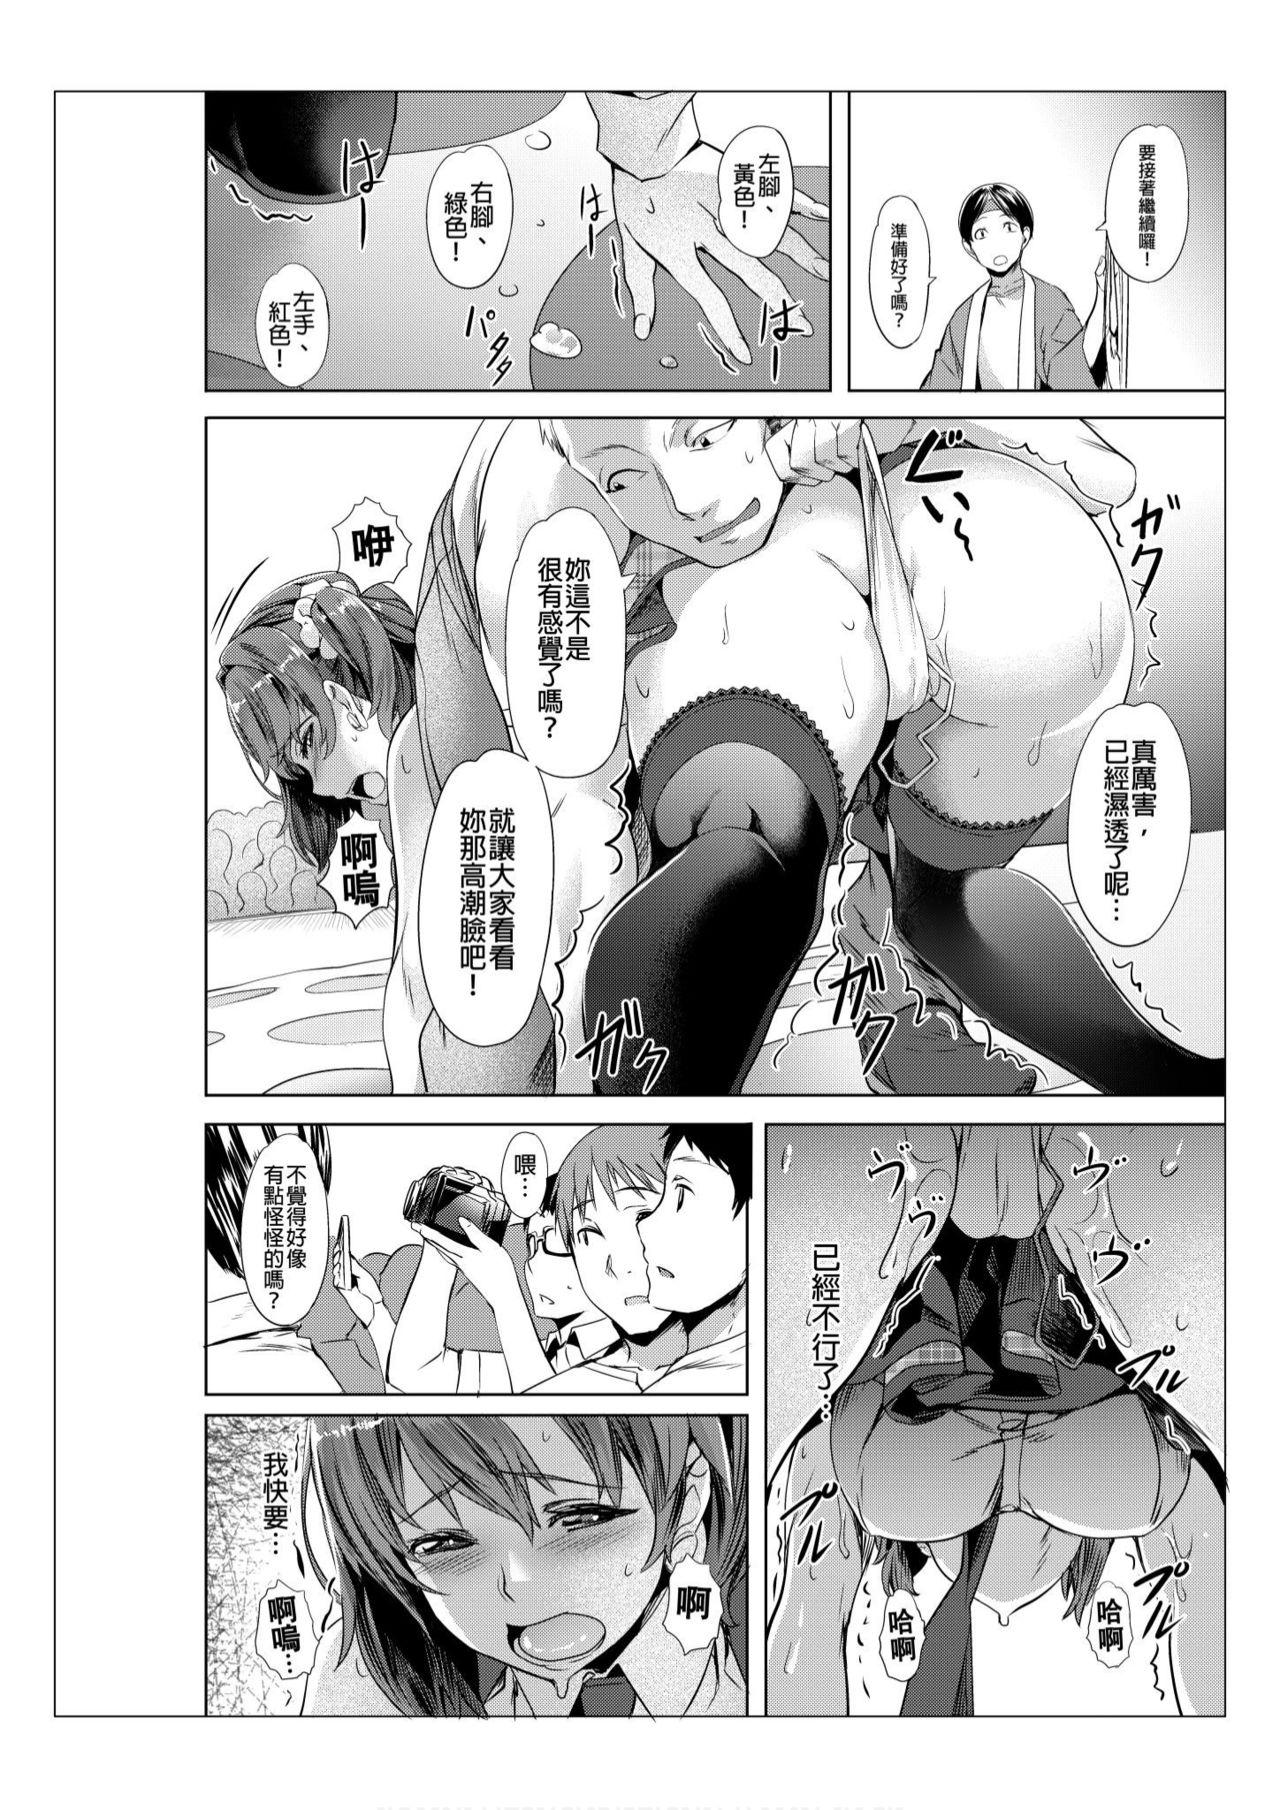 [Nagayori] Towel Ichimai de Otoko Buro.~ Shiranai Ojisan-tachi to Honiki Sex ~ | 只裹了條小毛巾就進男浴池的我。~被完全不認識的大叔們弄到高潮了~ [Chinese] [Decensored] 39